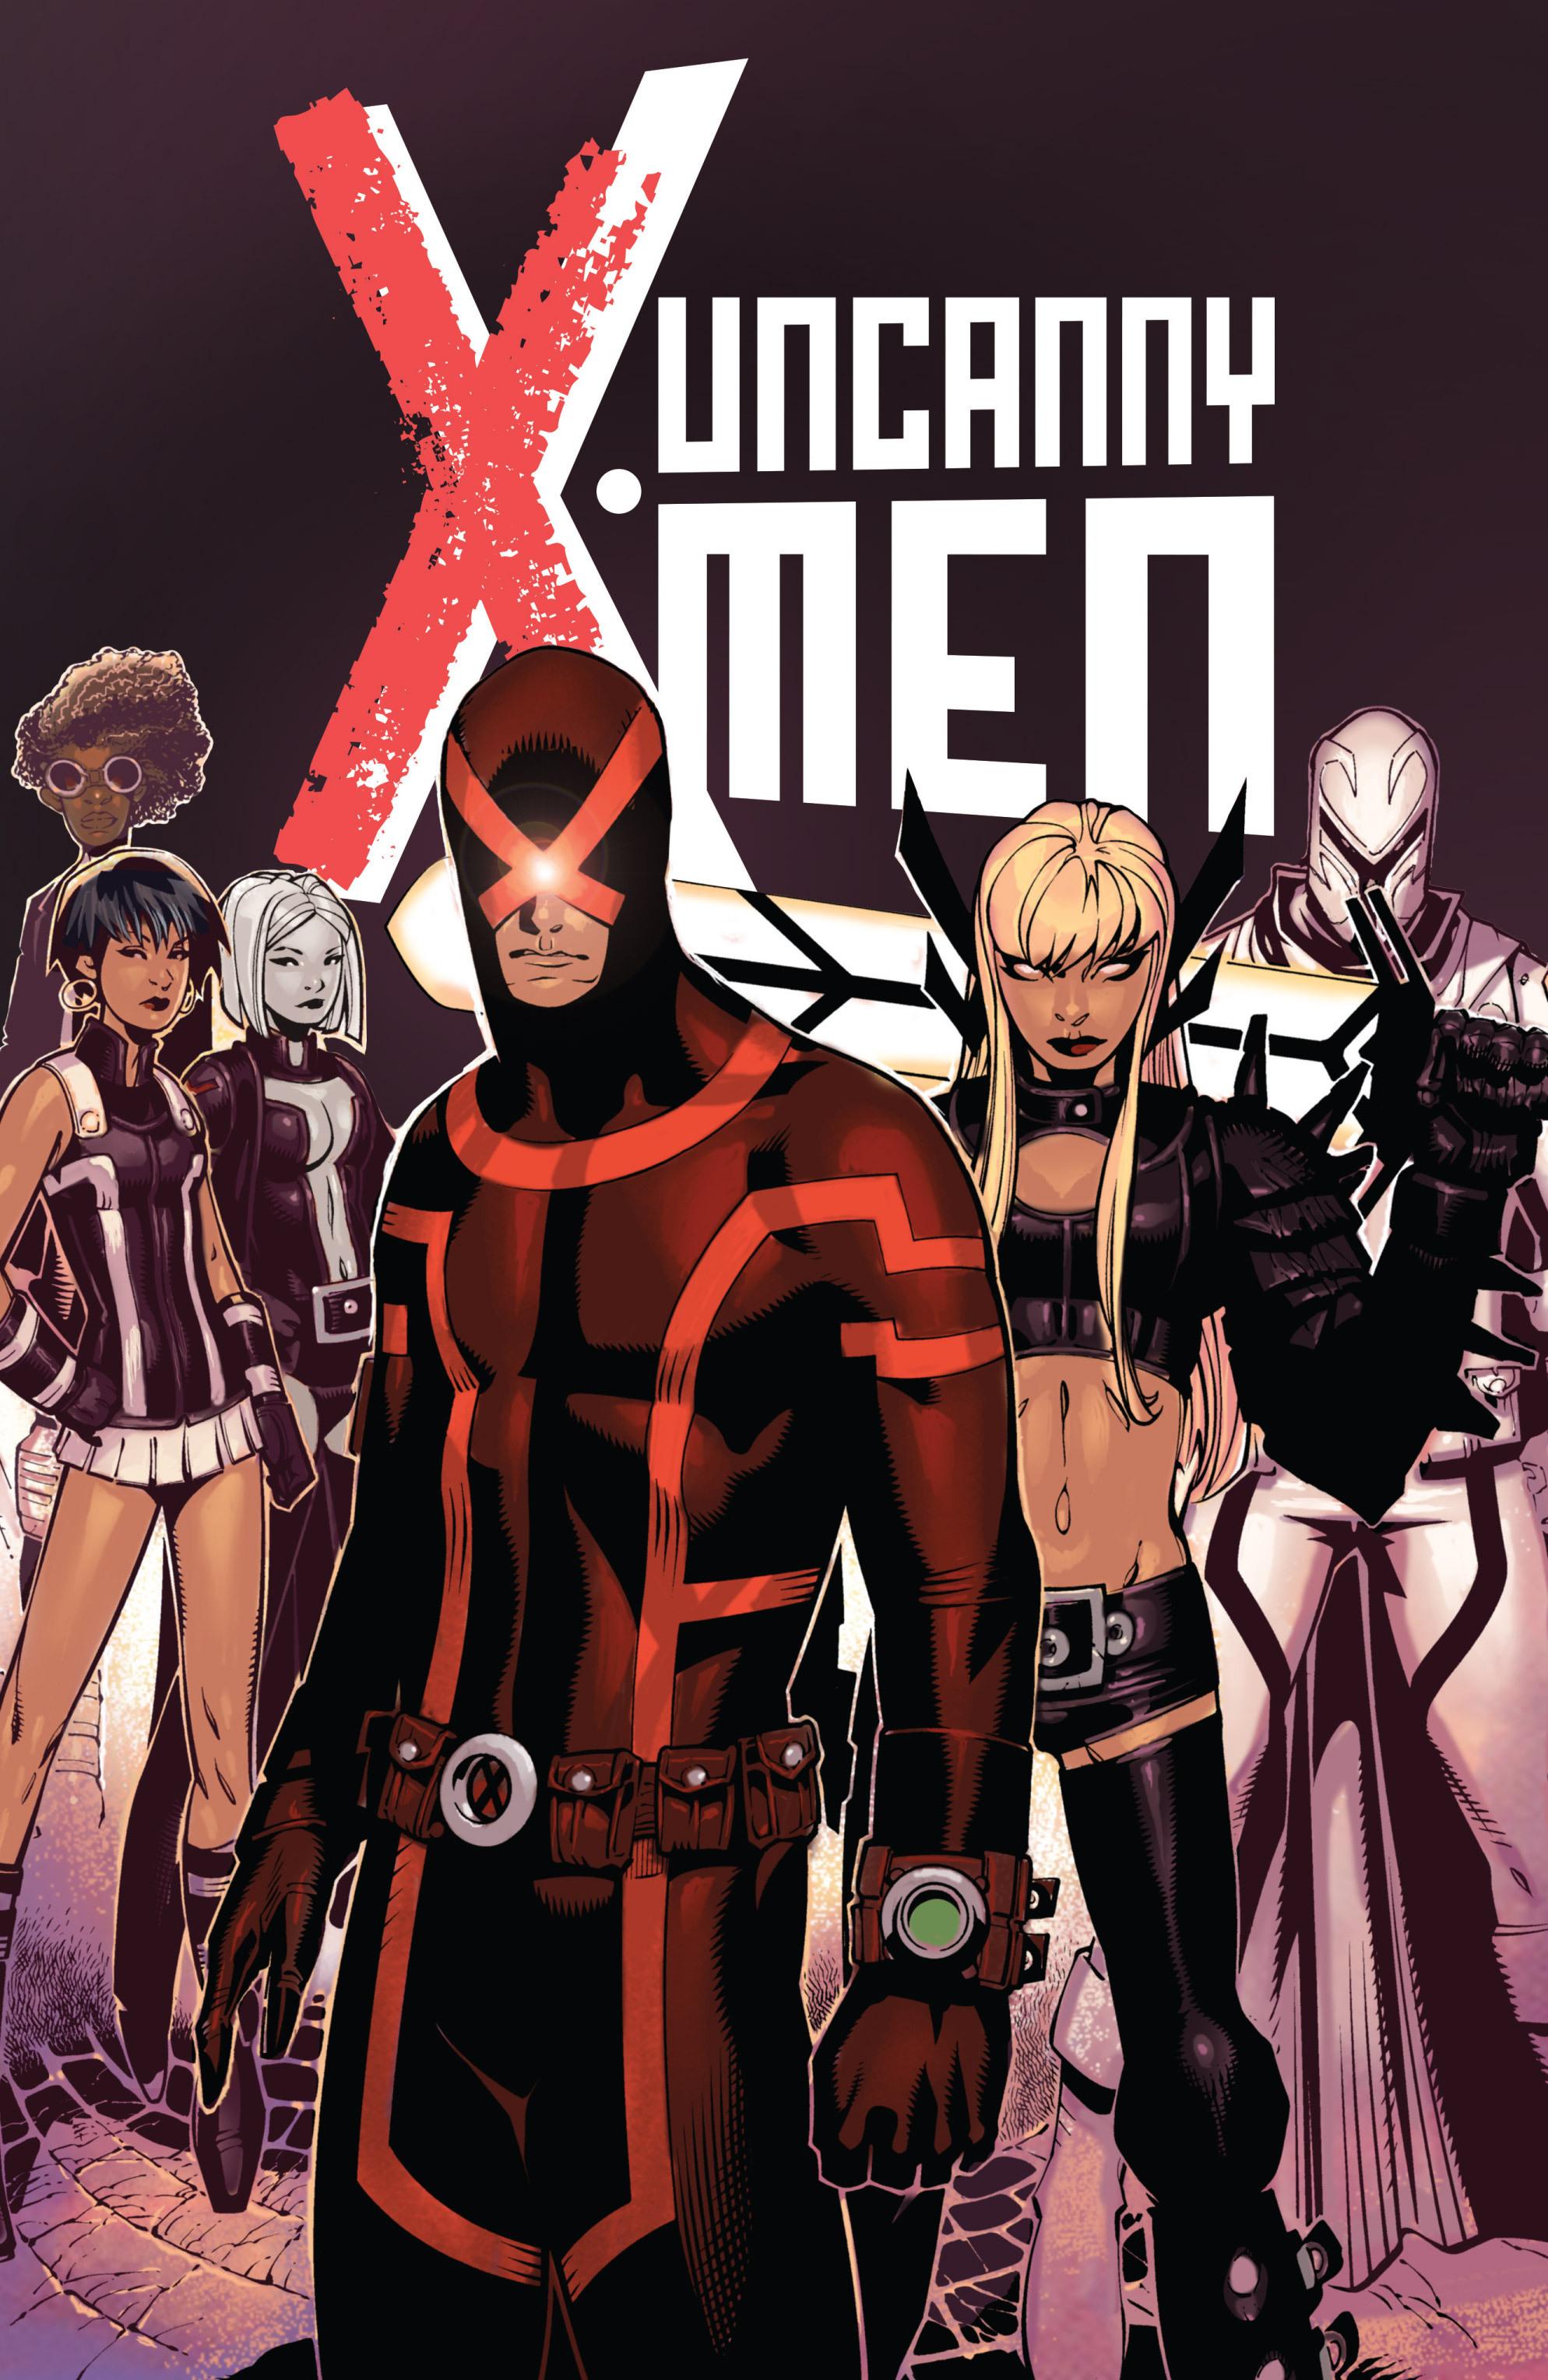 Read online Uncanny X-Men (2013) comic -  Issue # _TPB 1 - Revolution - 106